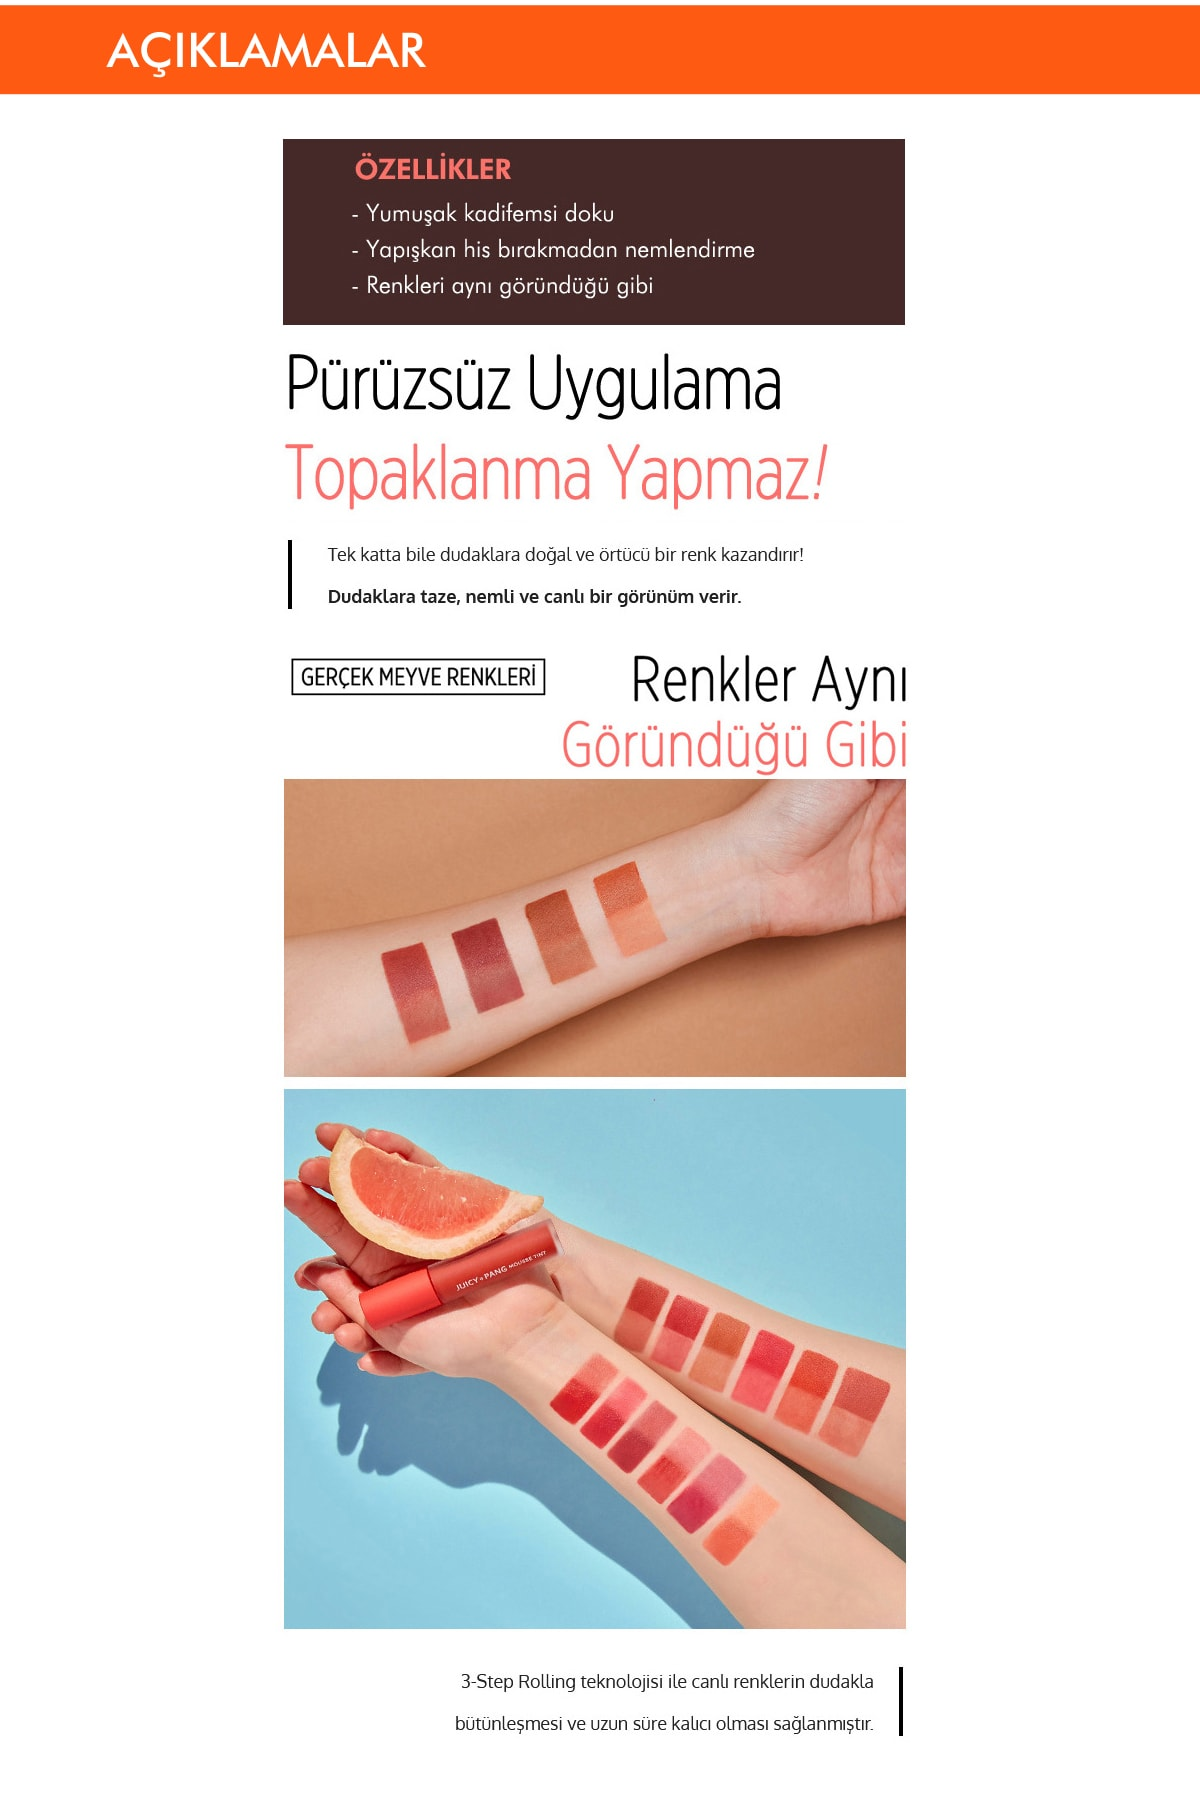 Missha Pürüzsüz Görünüm Sunan Kalıcı Köpük Tint  Ruj APIEU Juicy Pang Mousse Tint (CR03) 3